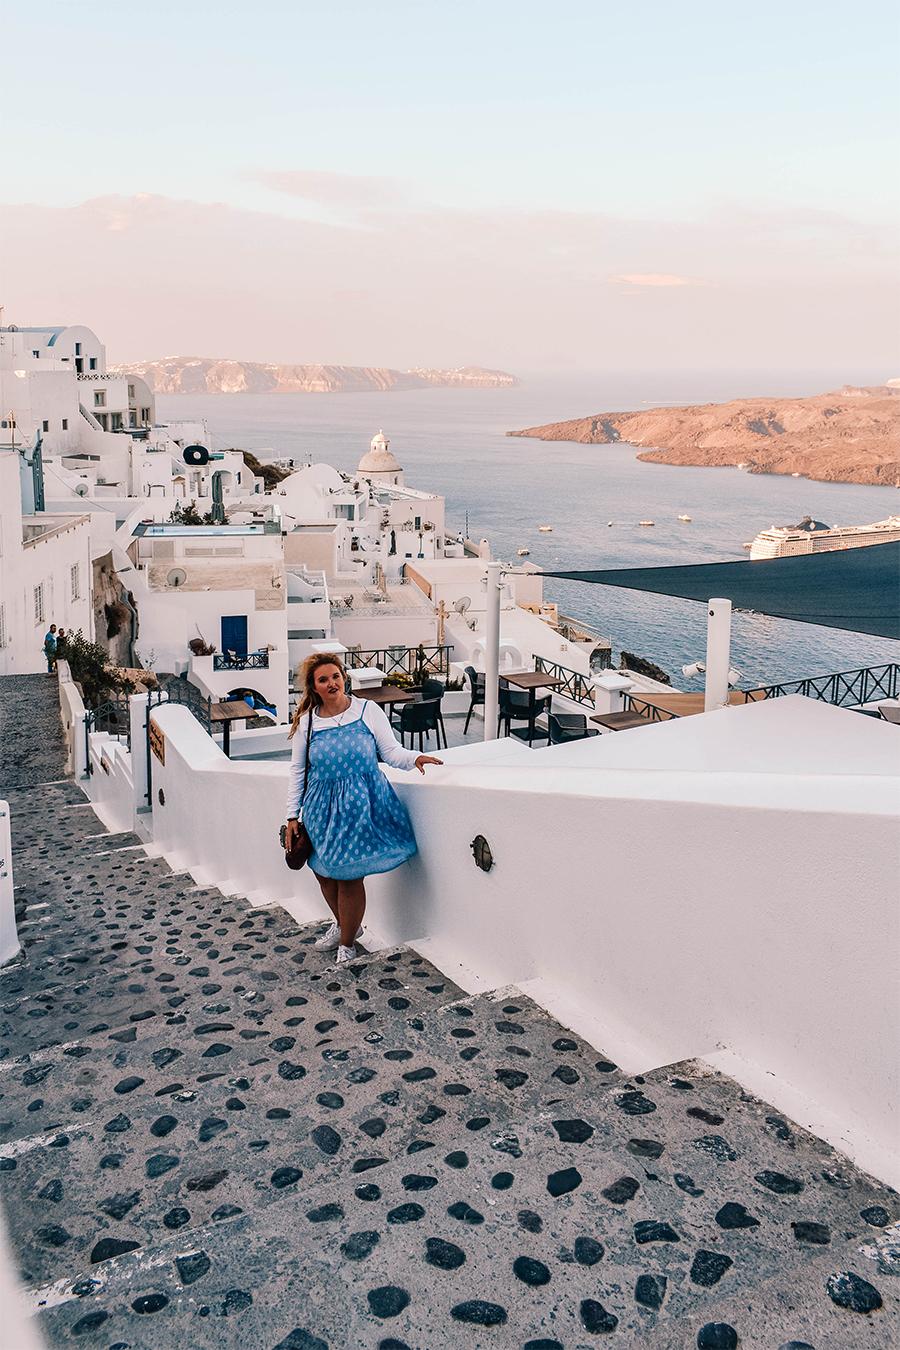 Faces Of Dame Traveler: Meet Helene In Between